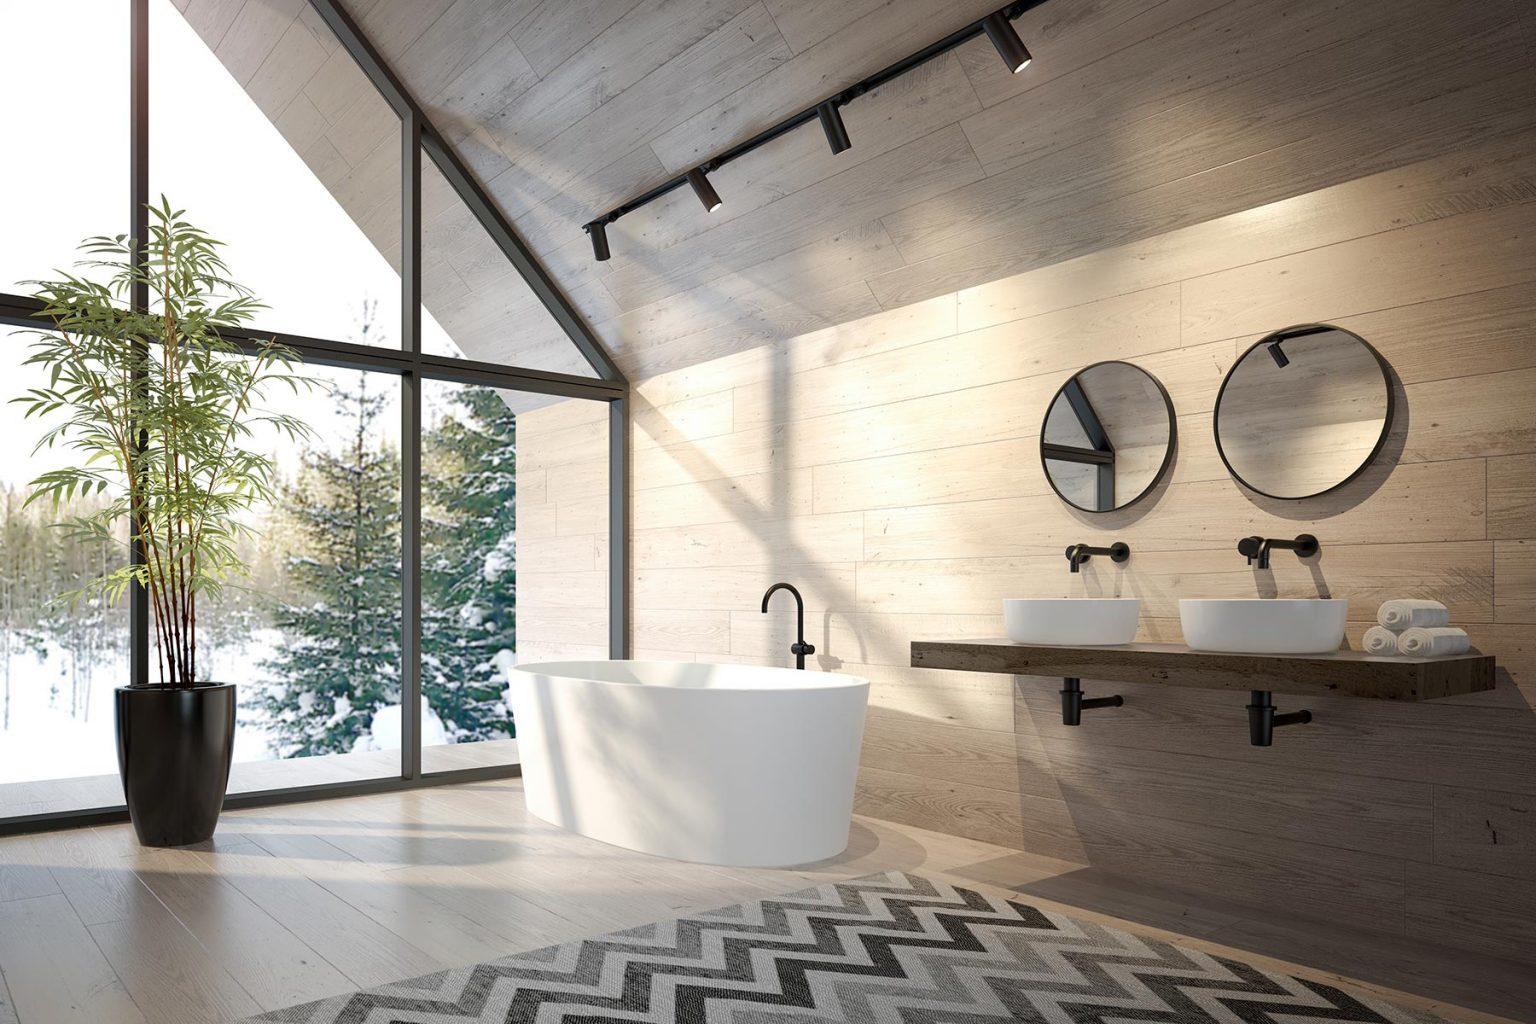 interior-bathroom-of-a-forest-house-3d-rendering-5DZ6ARQ.jpg